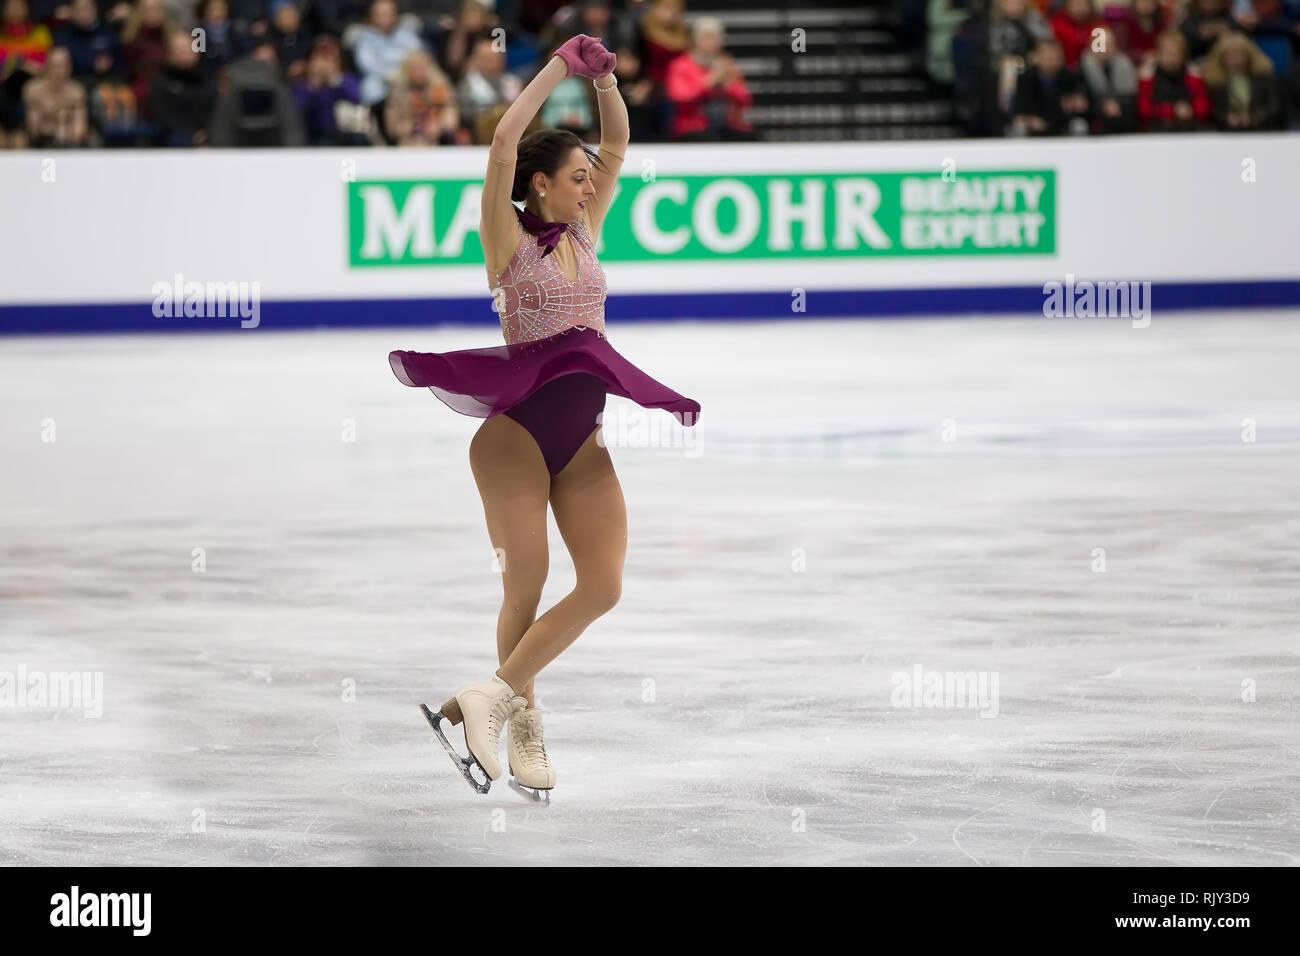 Eiskunstlauf Wm 2019 Tv